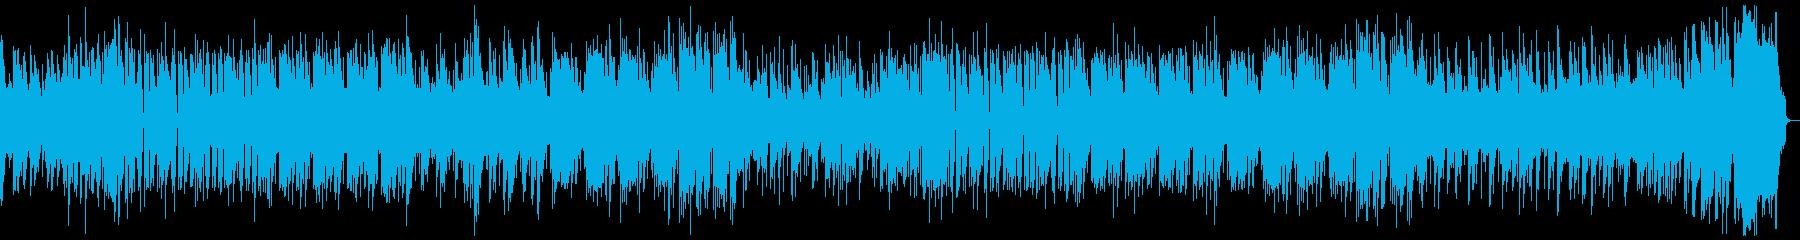 8bit ポップでスペースチックなBGMの再生済みの波形